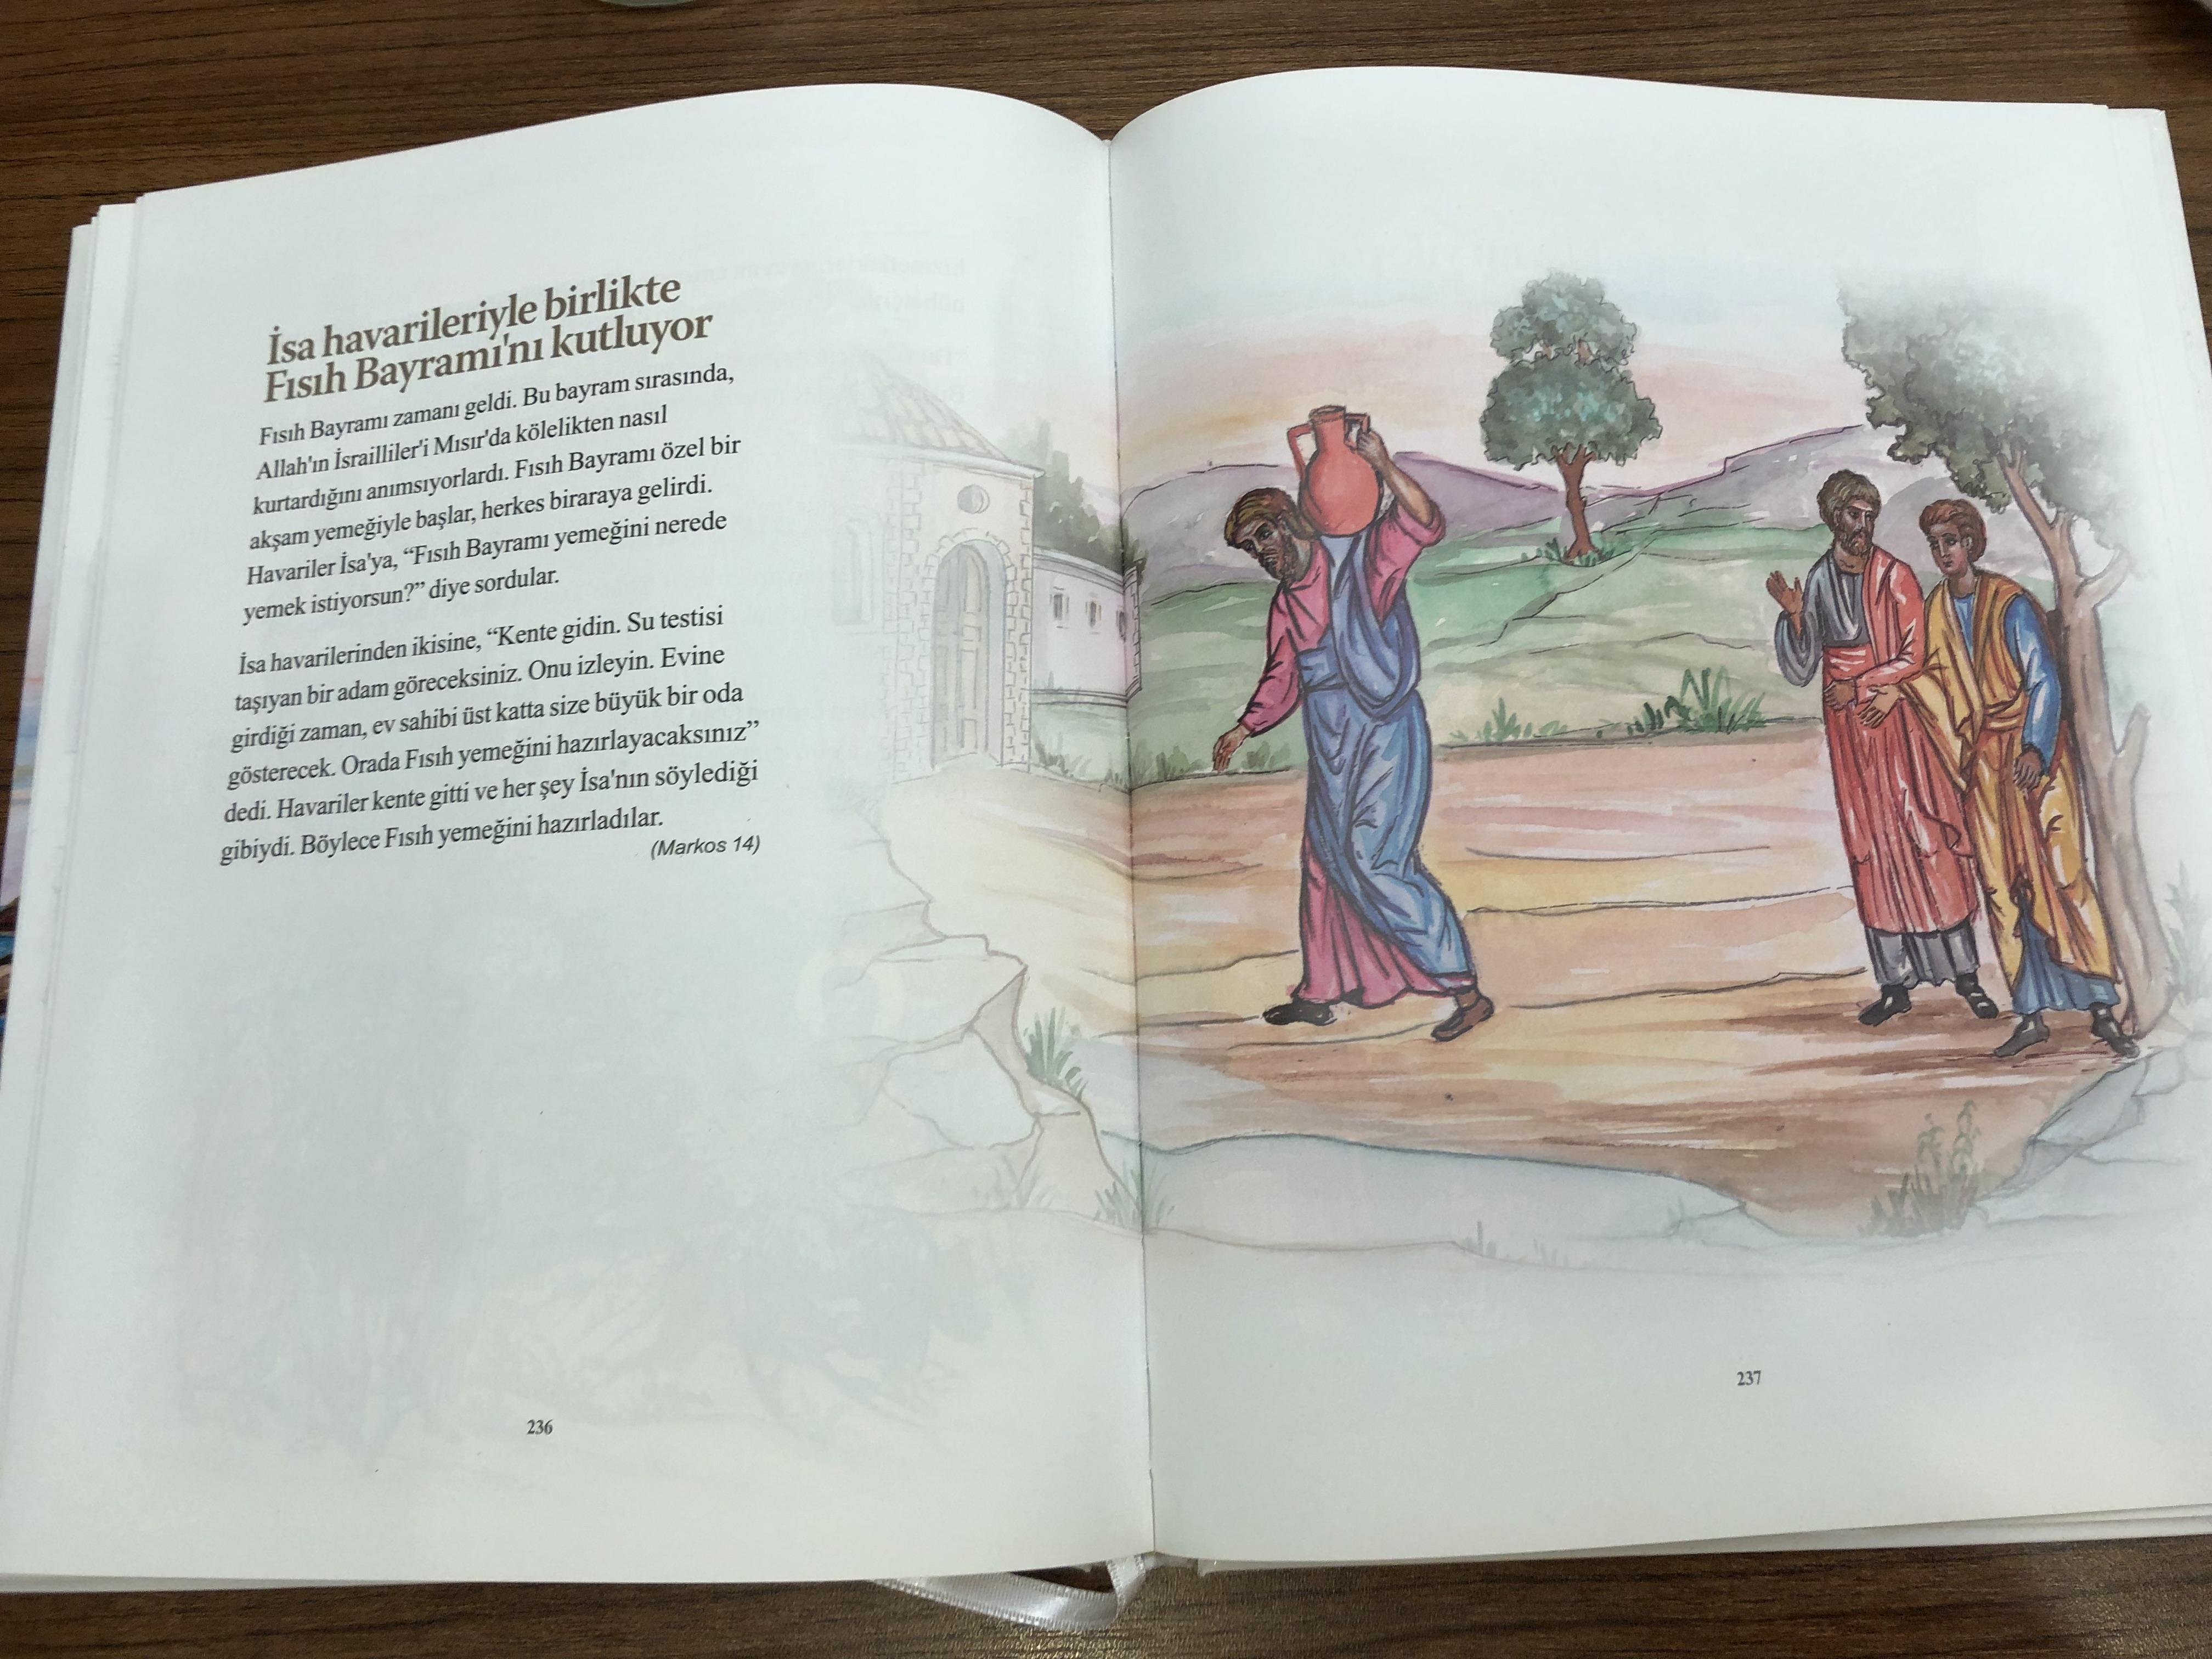 -ocuklara-kutsal-kitap-children-s-bible-reader-in-turkish-language-163-stories-from-the-bible-illustrated-in-color-hardcover-2010-10-.jpg